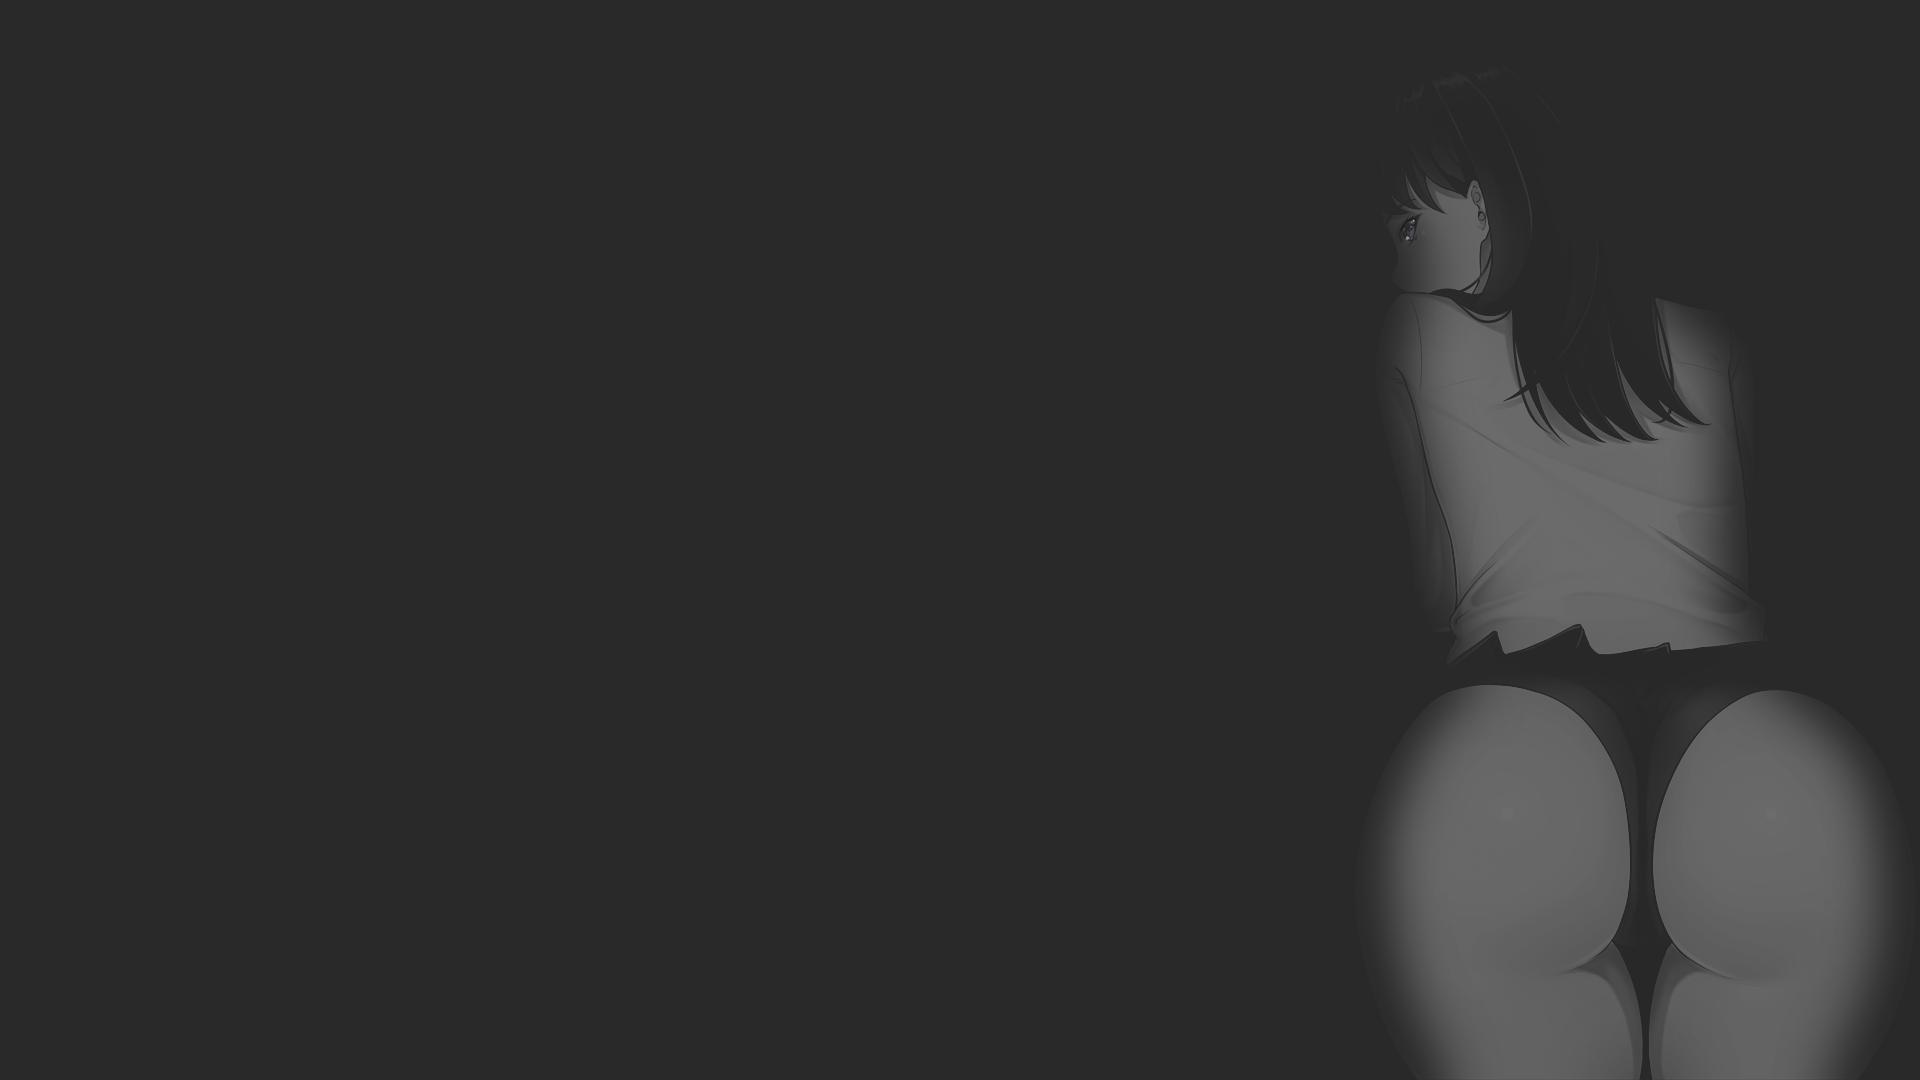 Anime 1920x1080 anime manga anime girls illustration dark background texture minimalism monochrome SSSS.GRIDMAN erotic art  ecchi pantsu shot uniform school uniform ass